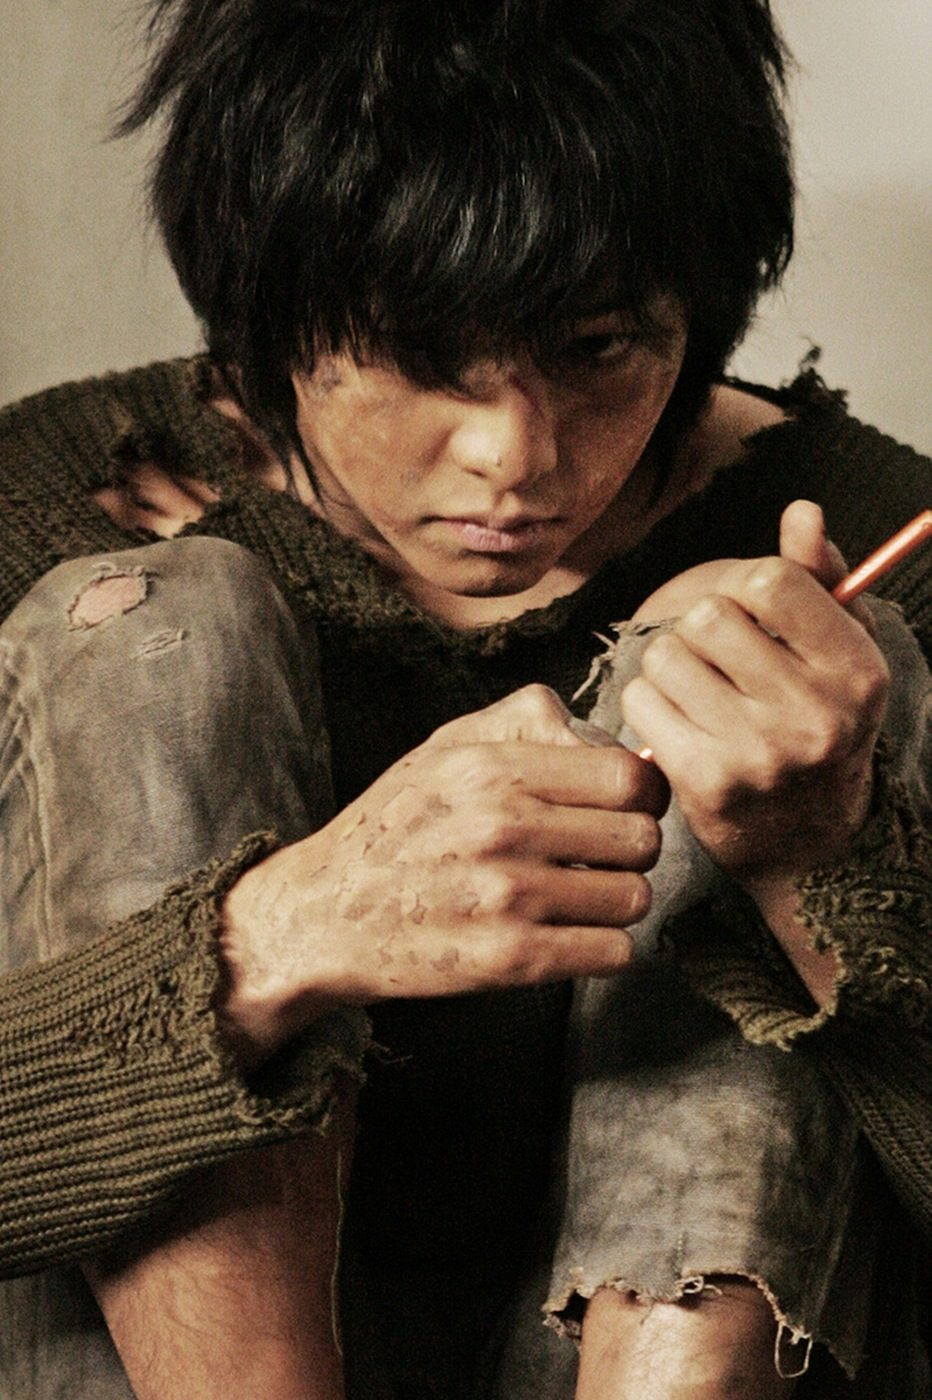 a-werewolf-boy-2012-Jo-Sung-hee-1.jpg